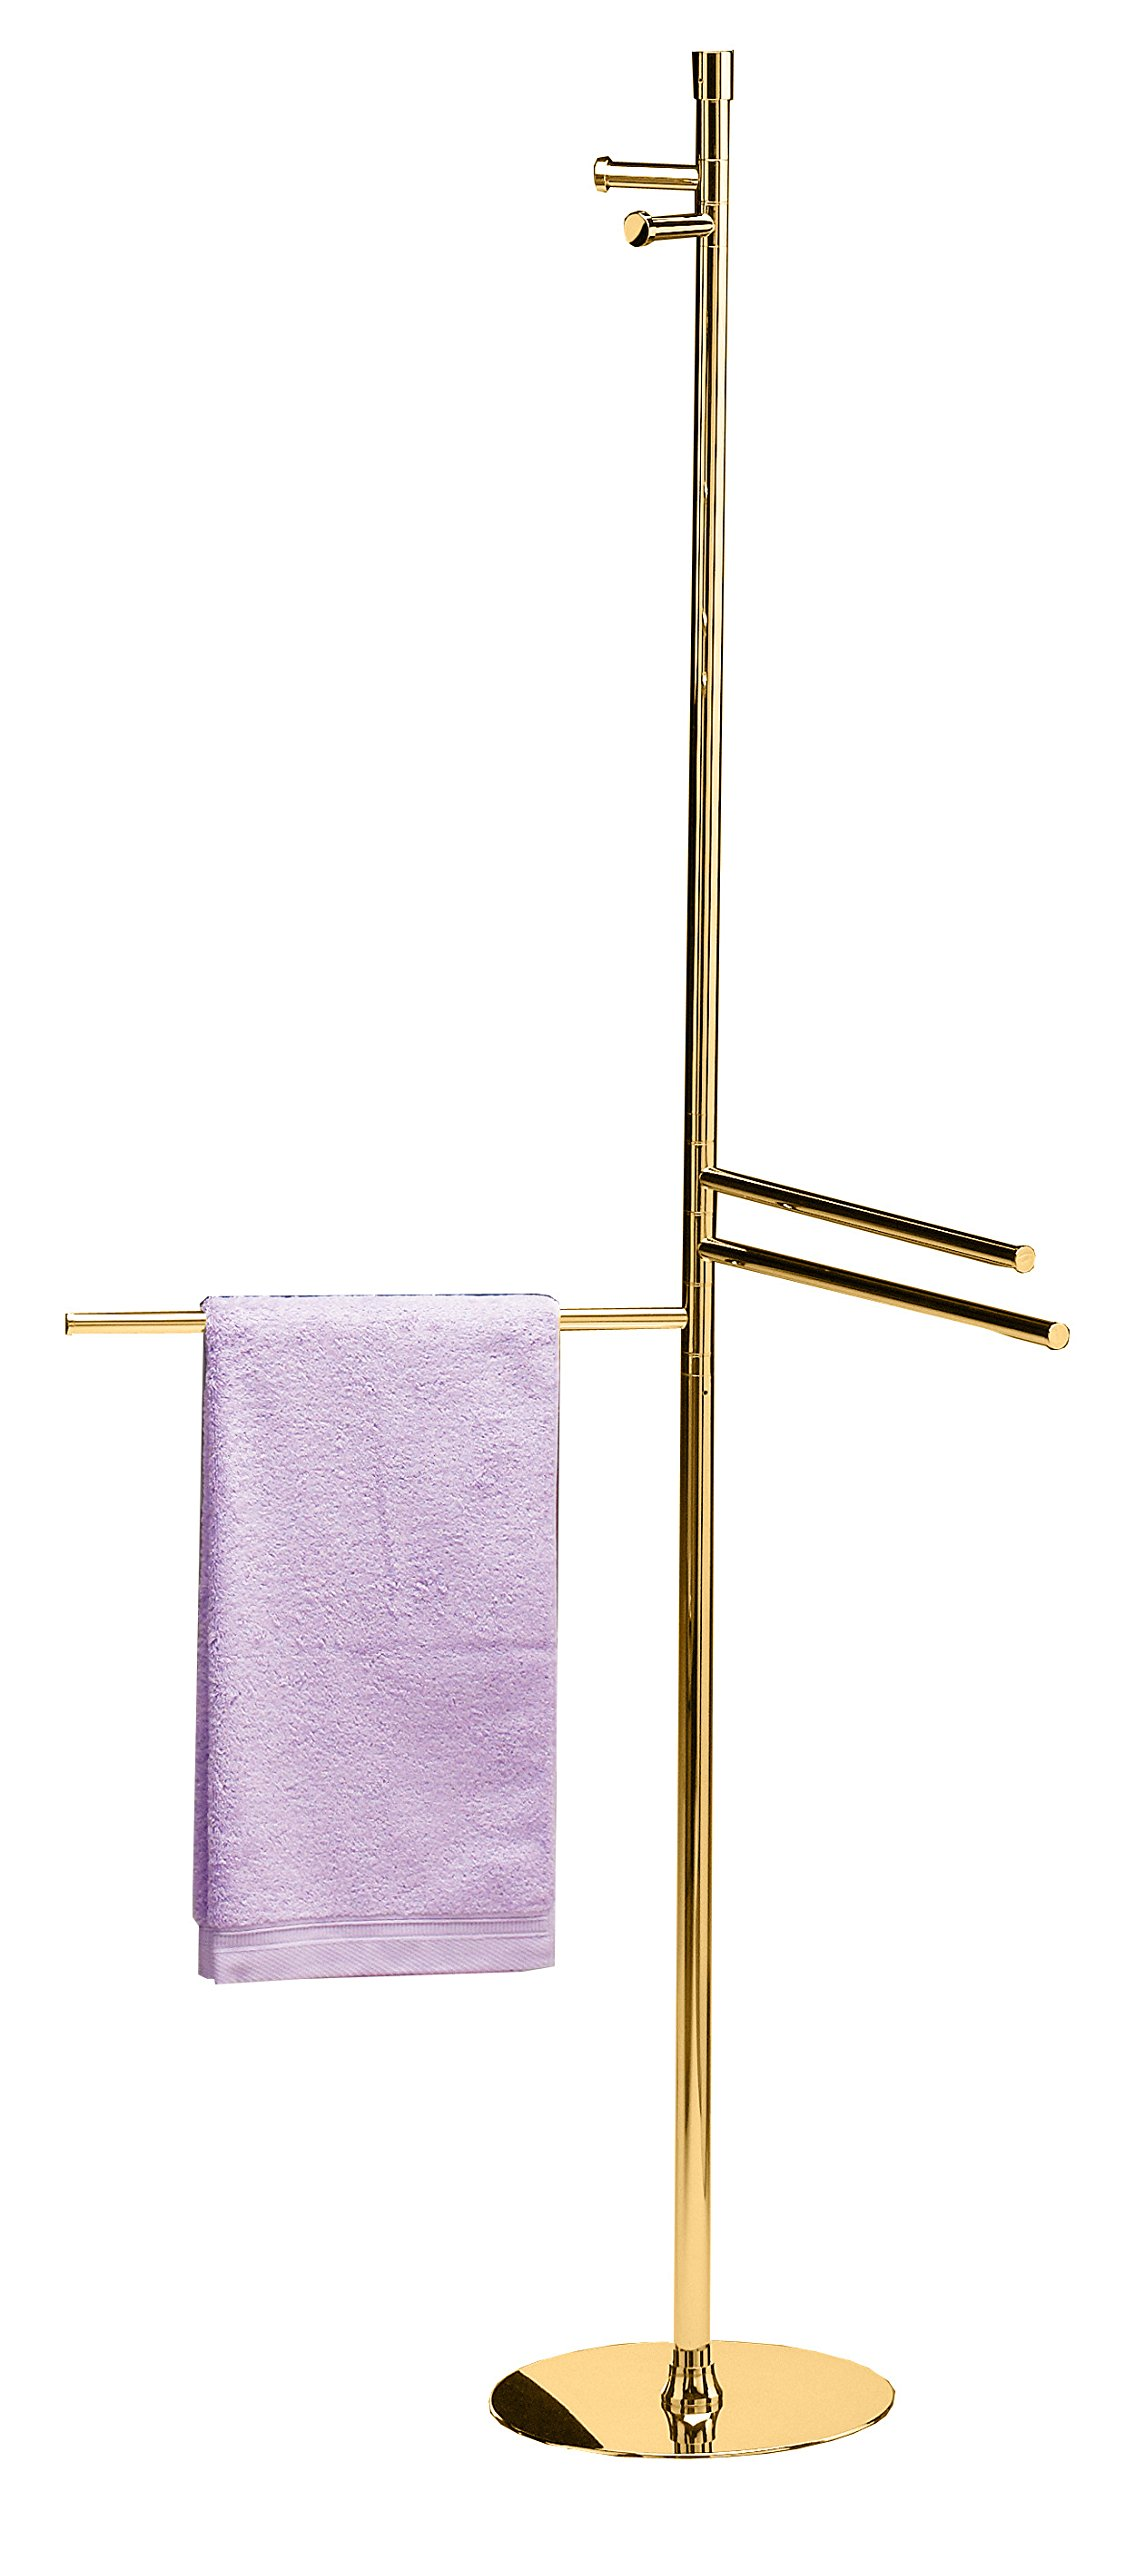 Floor Standing Coat Towel Rack 2-hook Stand Bar 3-tier Towel Bar, Brass (Polished Gold)